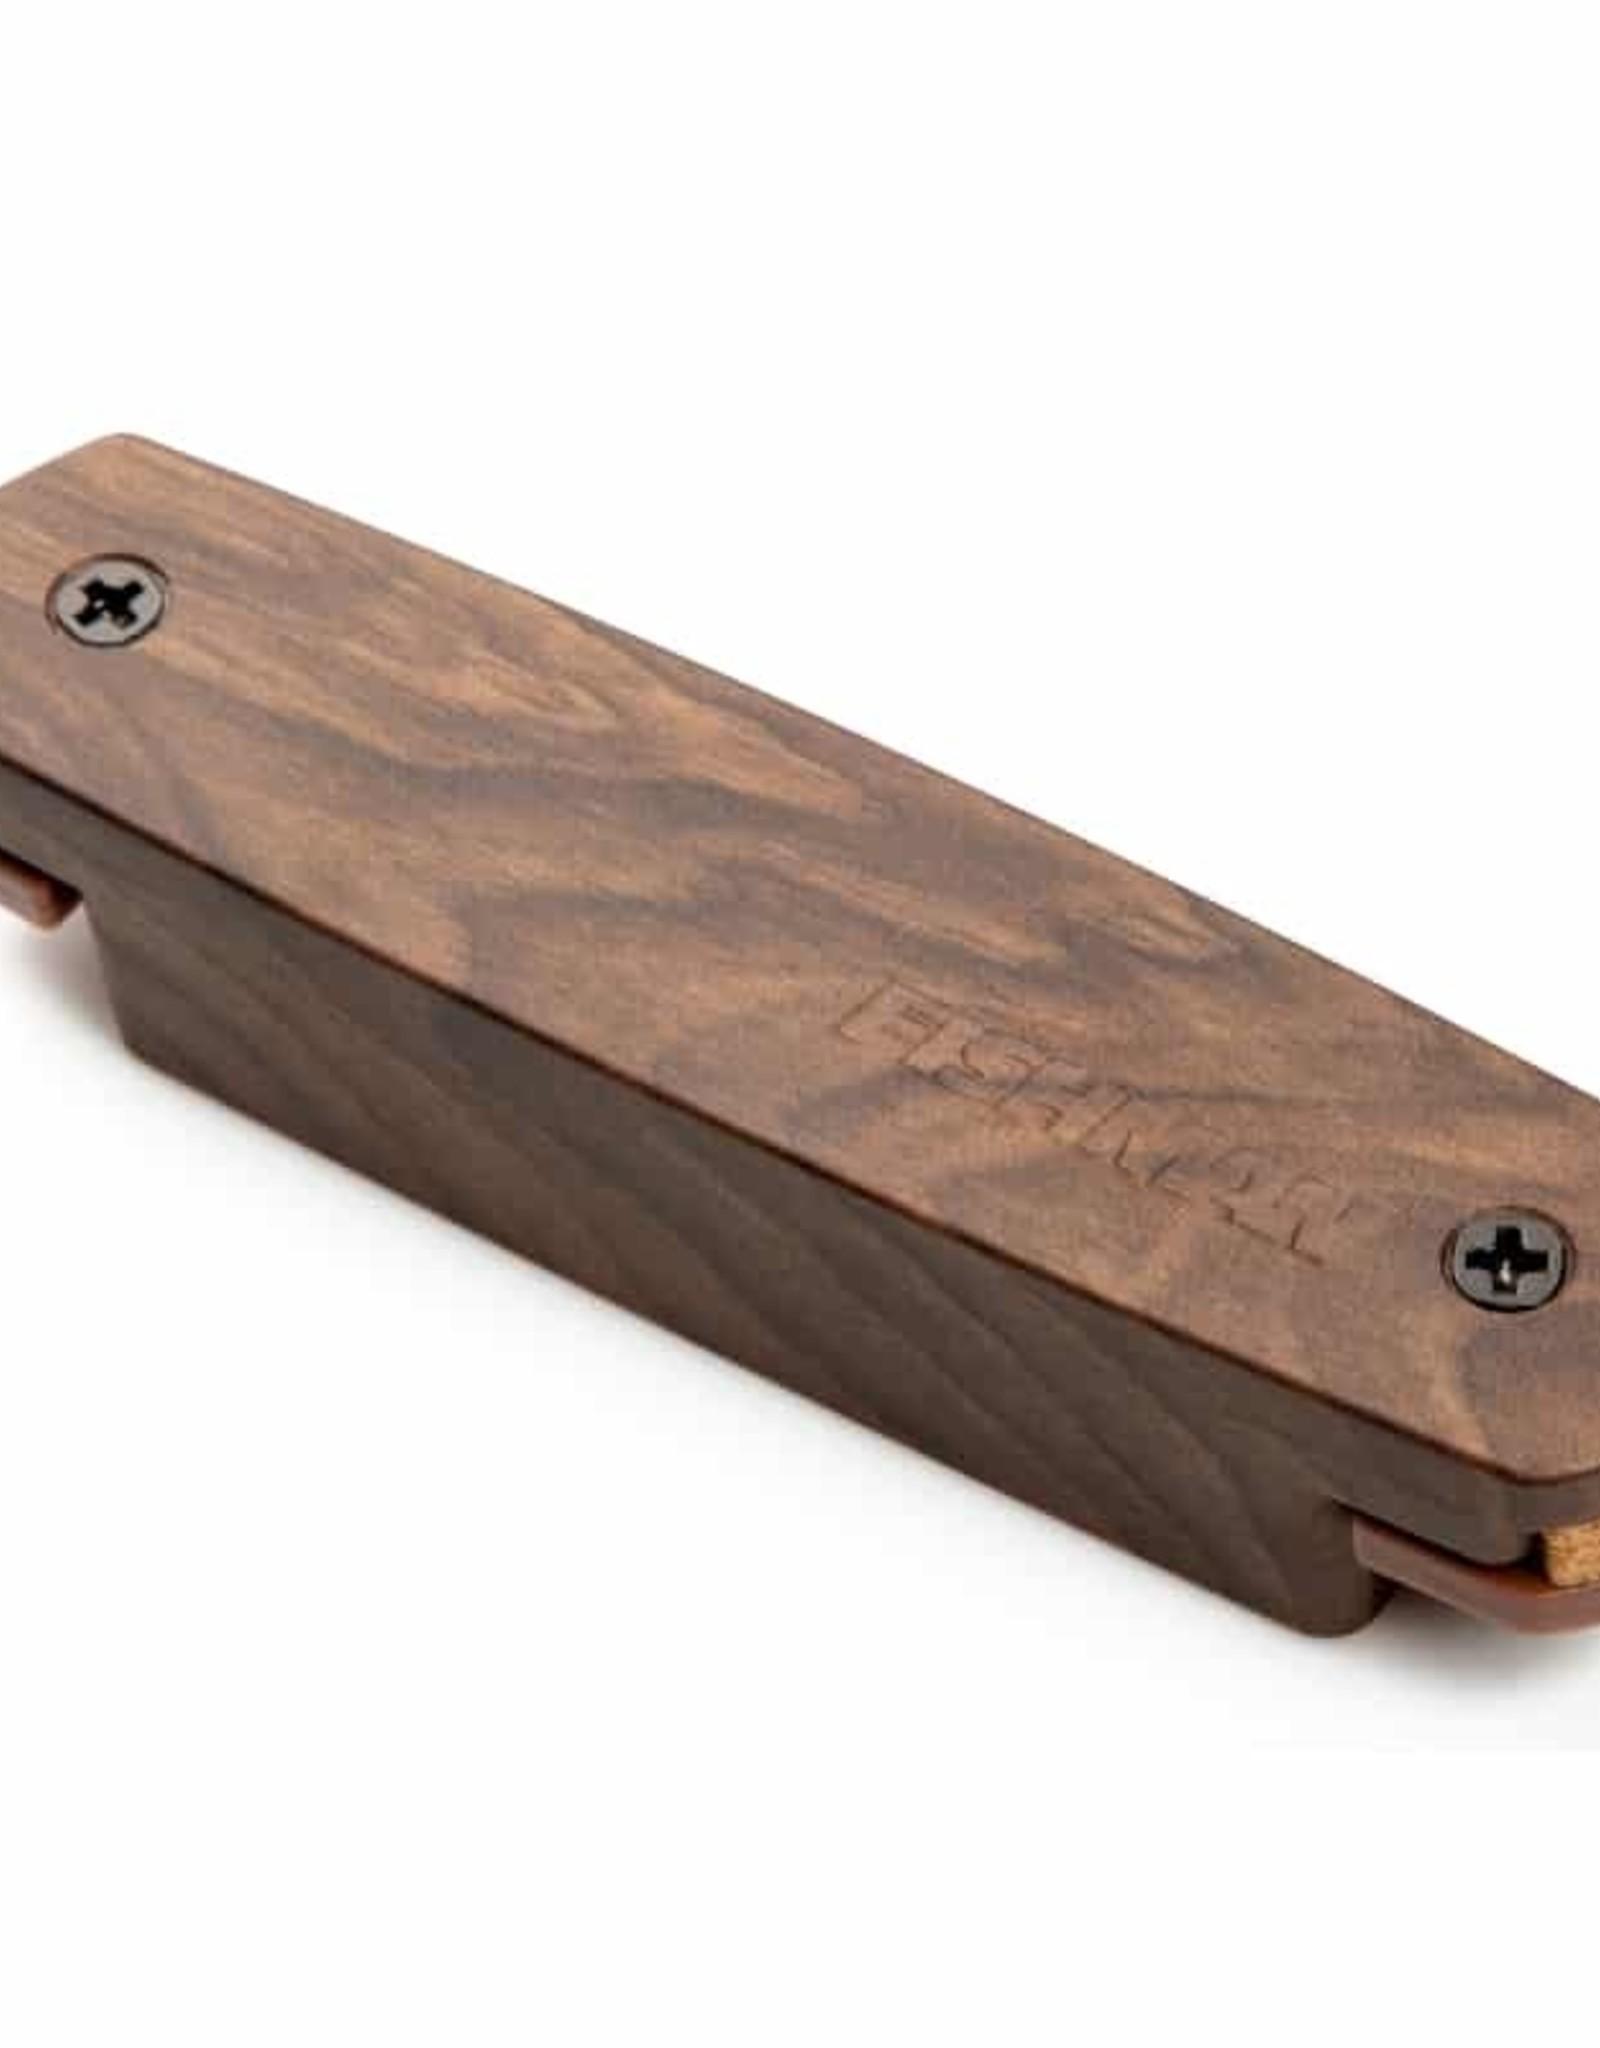 Fishman Neo-D Single Coil Pickup, Woodgrain